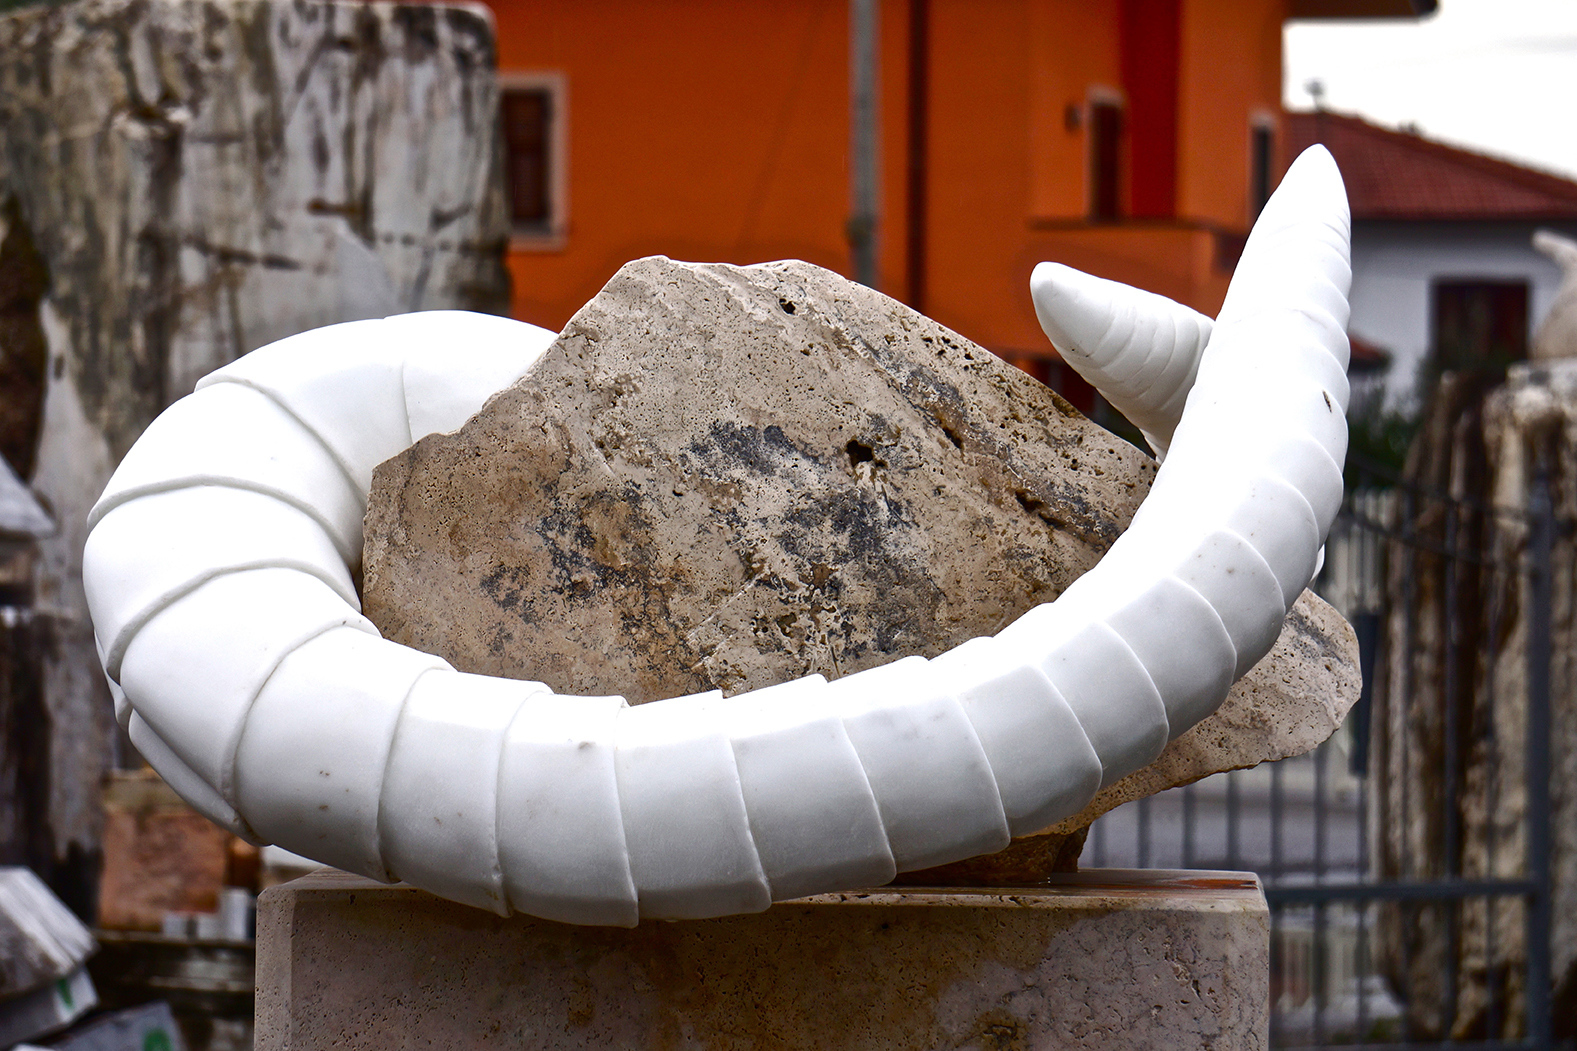 Bestia Romana image